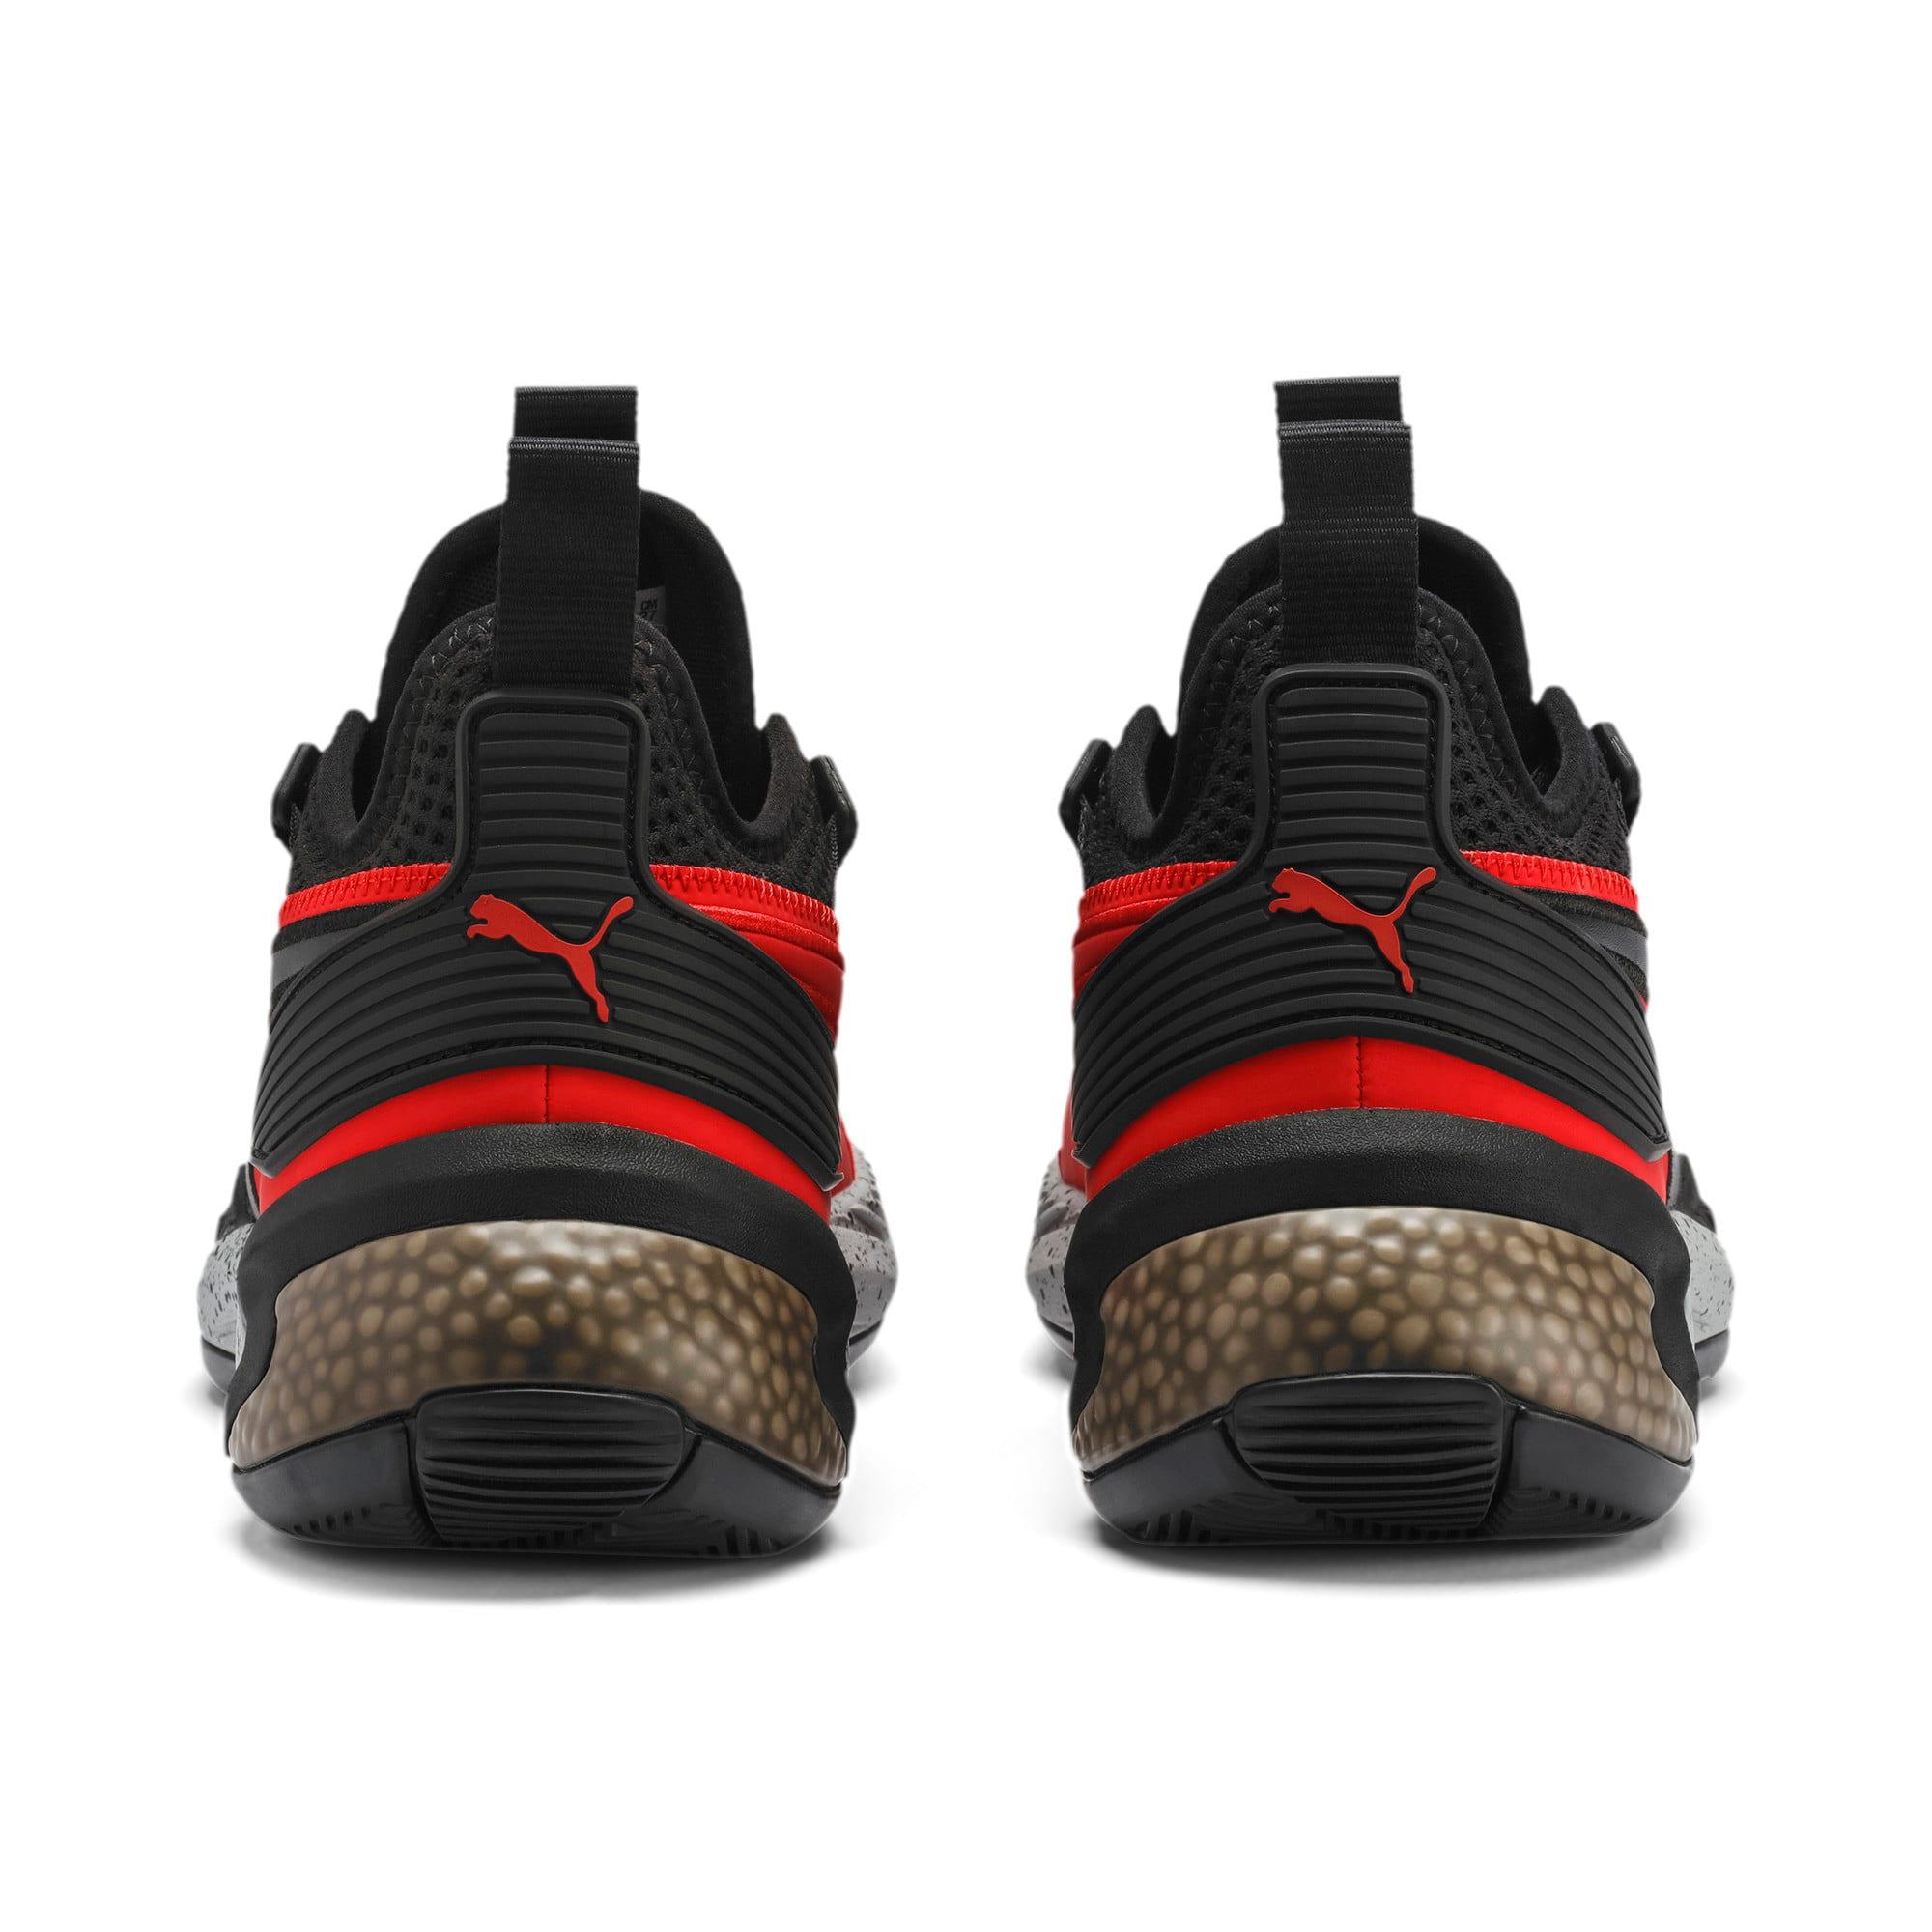 Thumbnail 3 of Uproar Core Men's Basketball Shoes, High Risk Red-Puma Black, medium